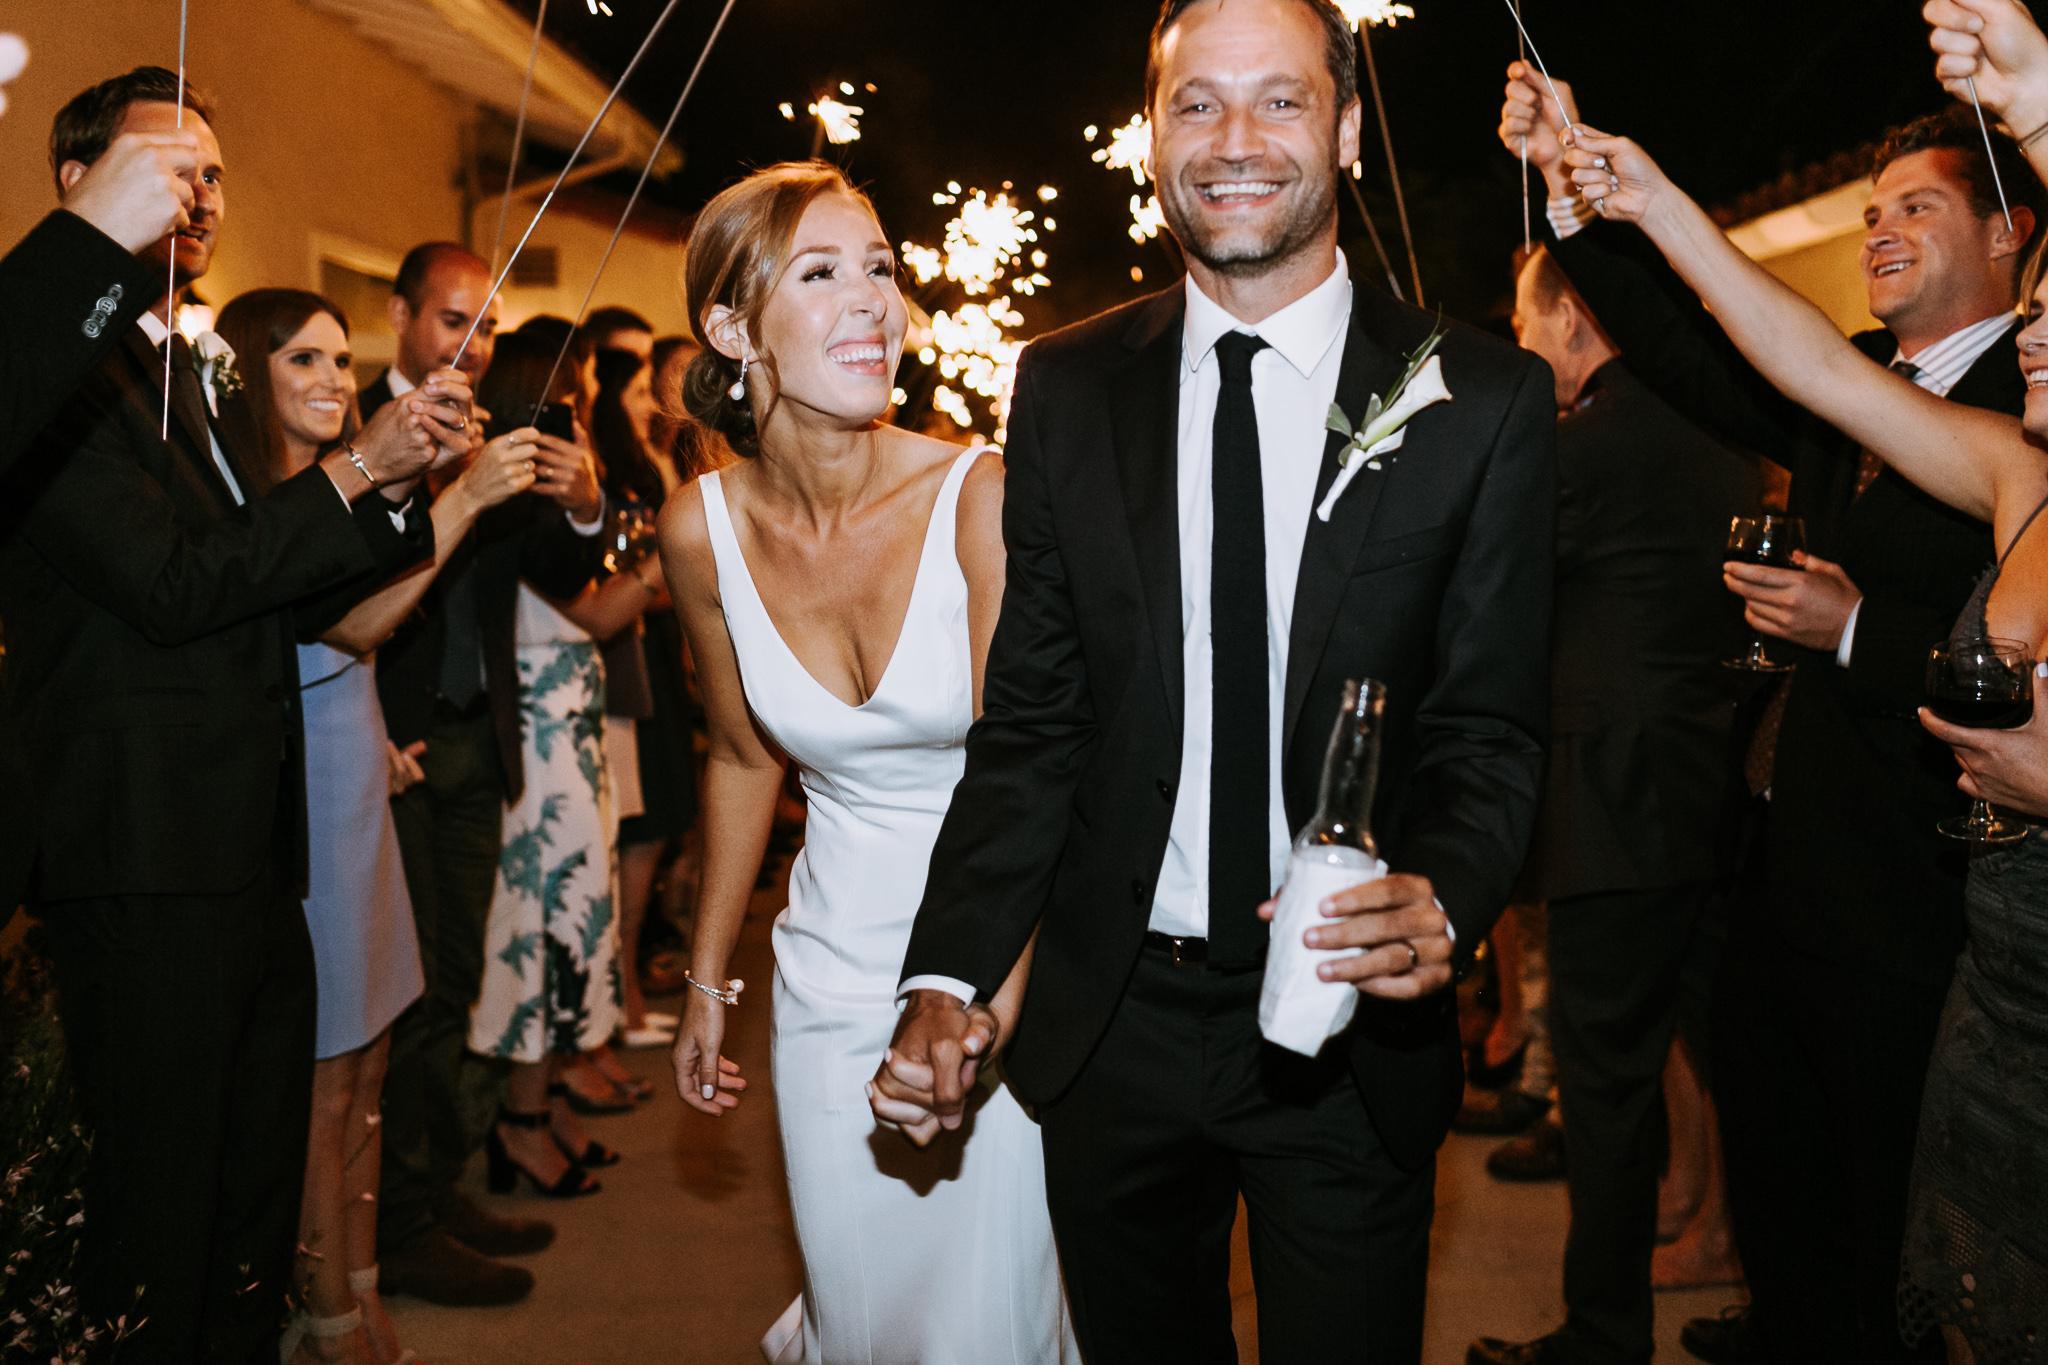 San-Diego-Wedding-Photographer-39.jpg